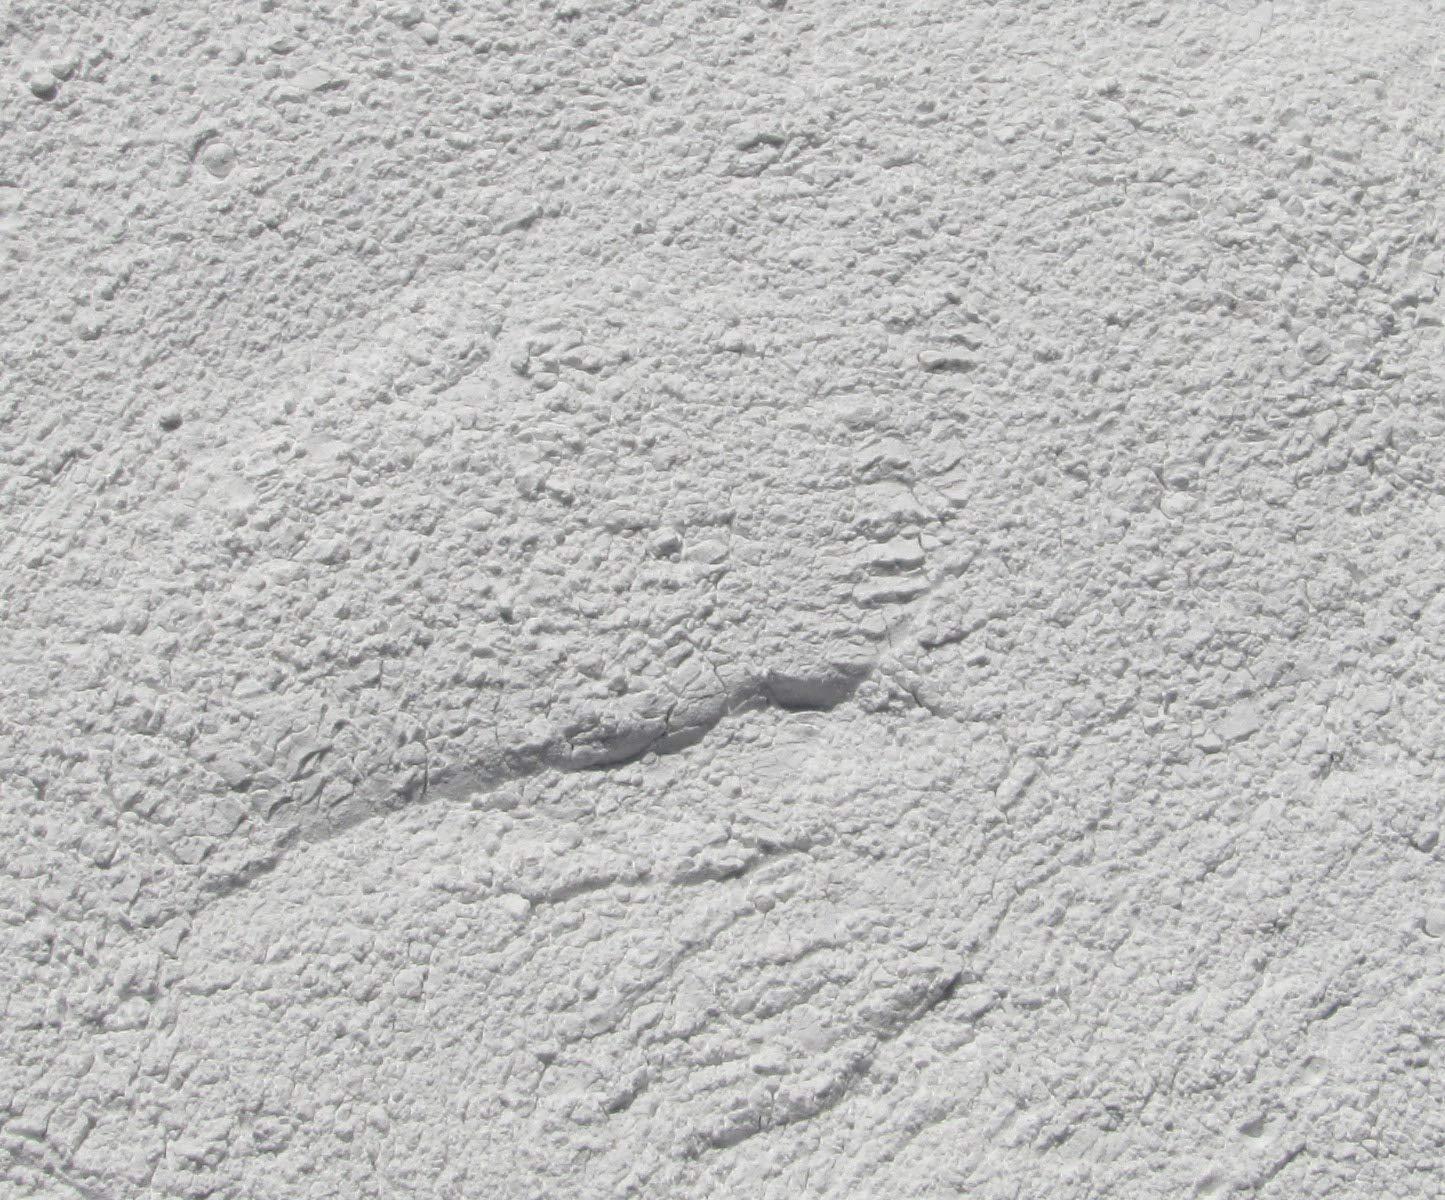 4 Lb. 1200 Grit - Final Polish Aluminium Oxide Rotary Vibratory Rock Tumbler Tumbling Polishing Powder Abrasive Grit by Algrium (Image #1)